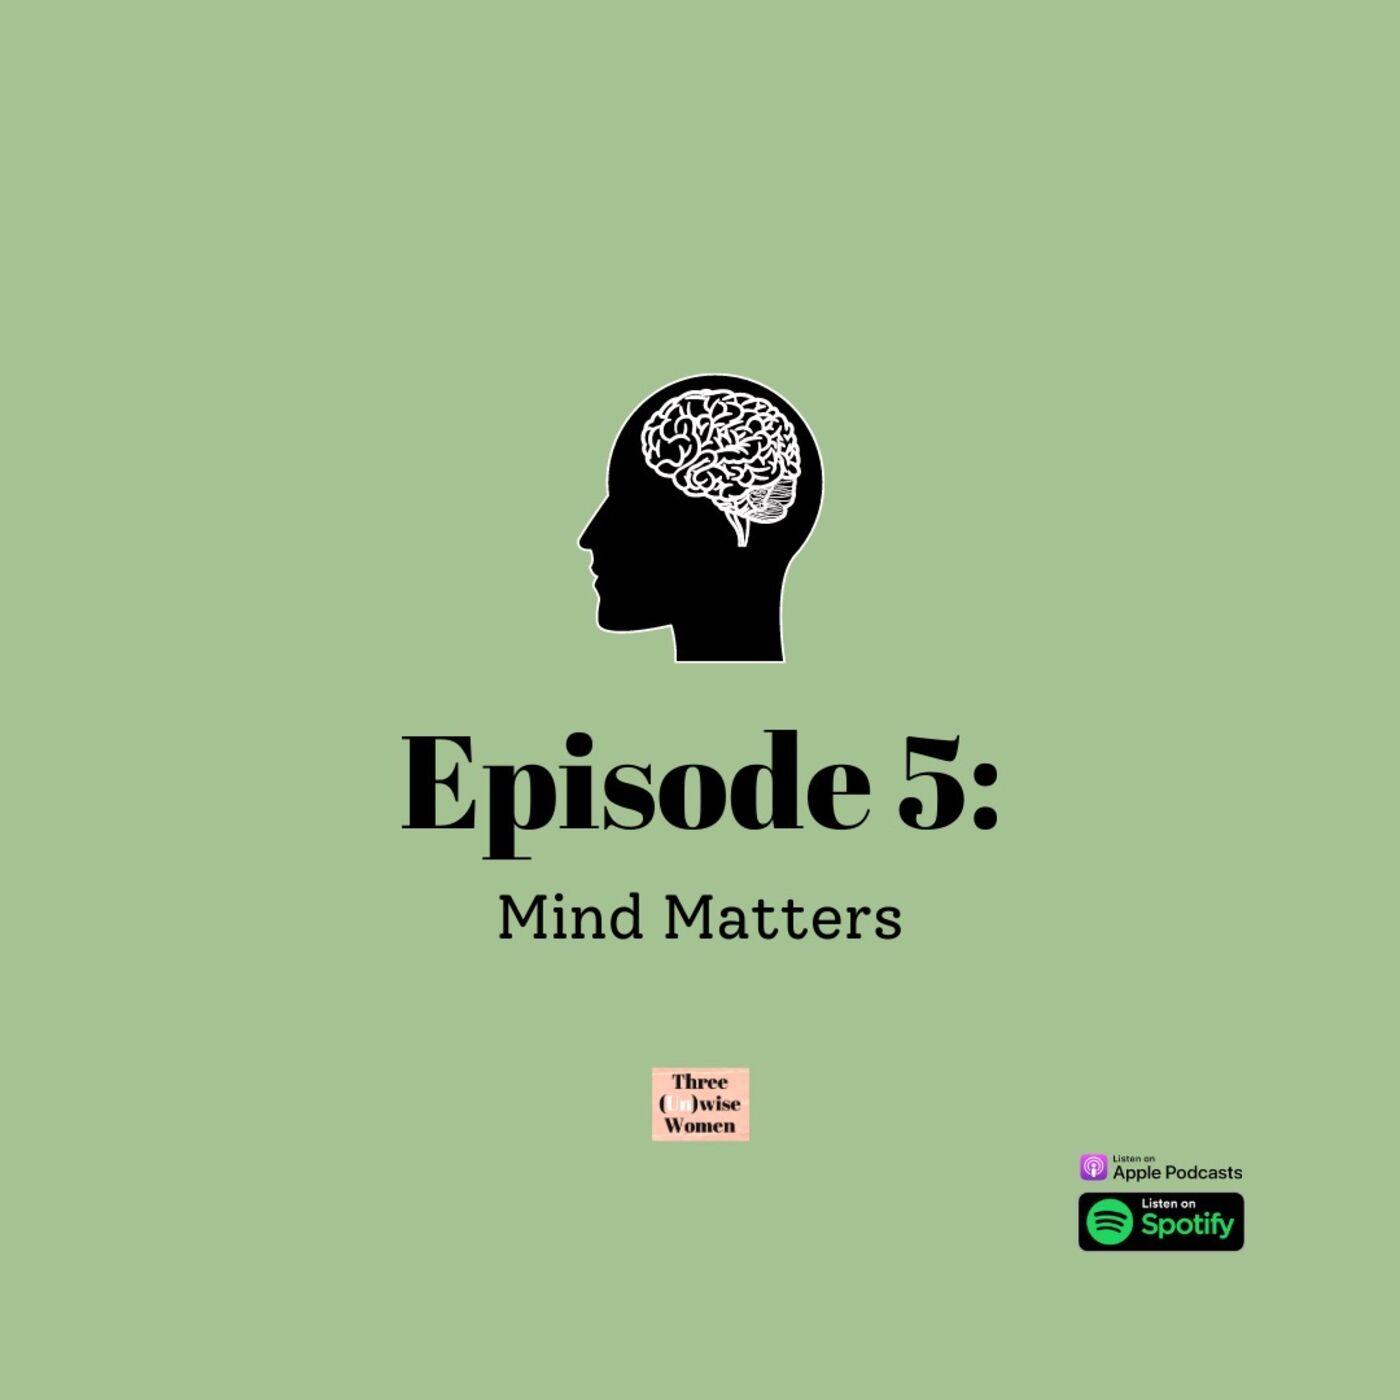 Mind Matters